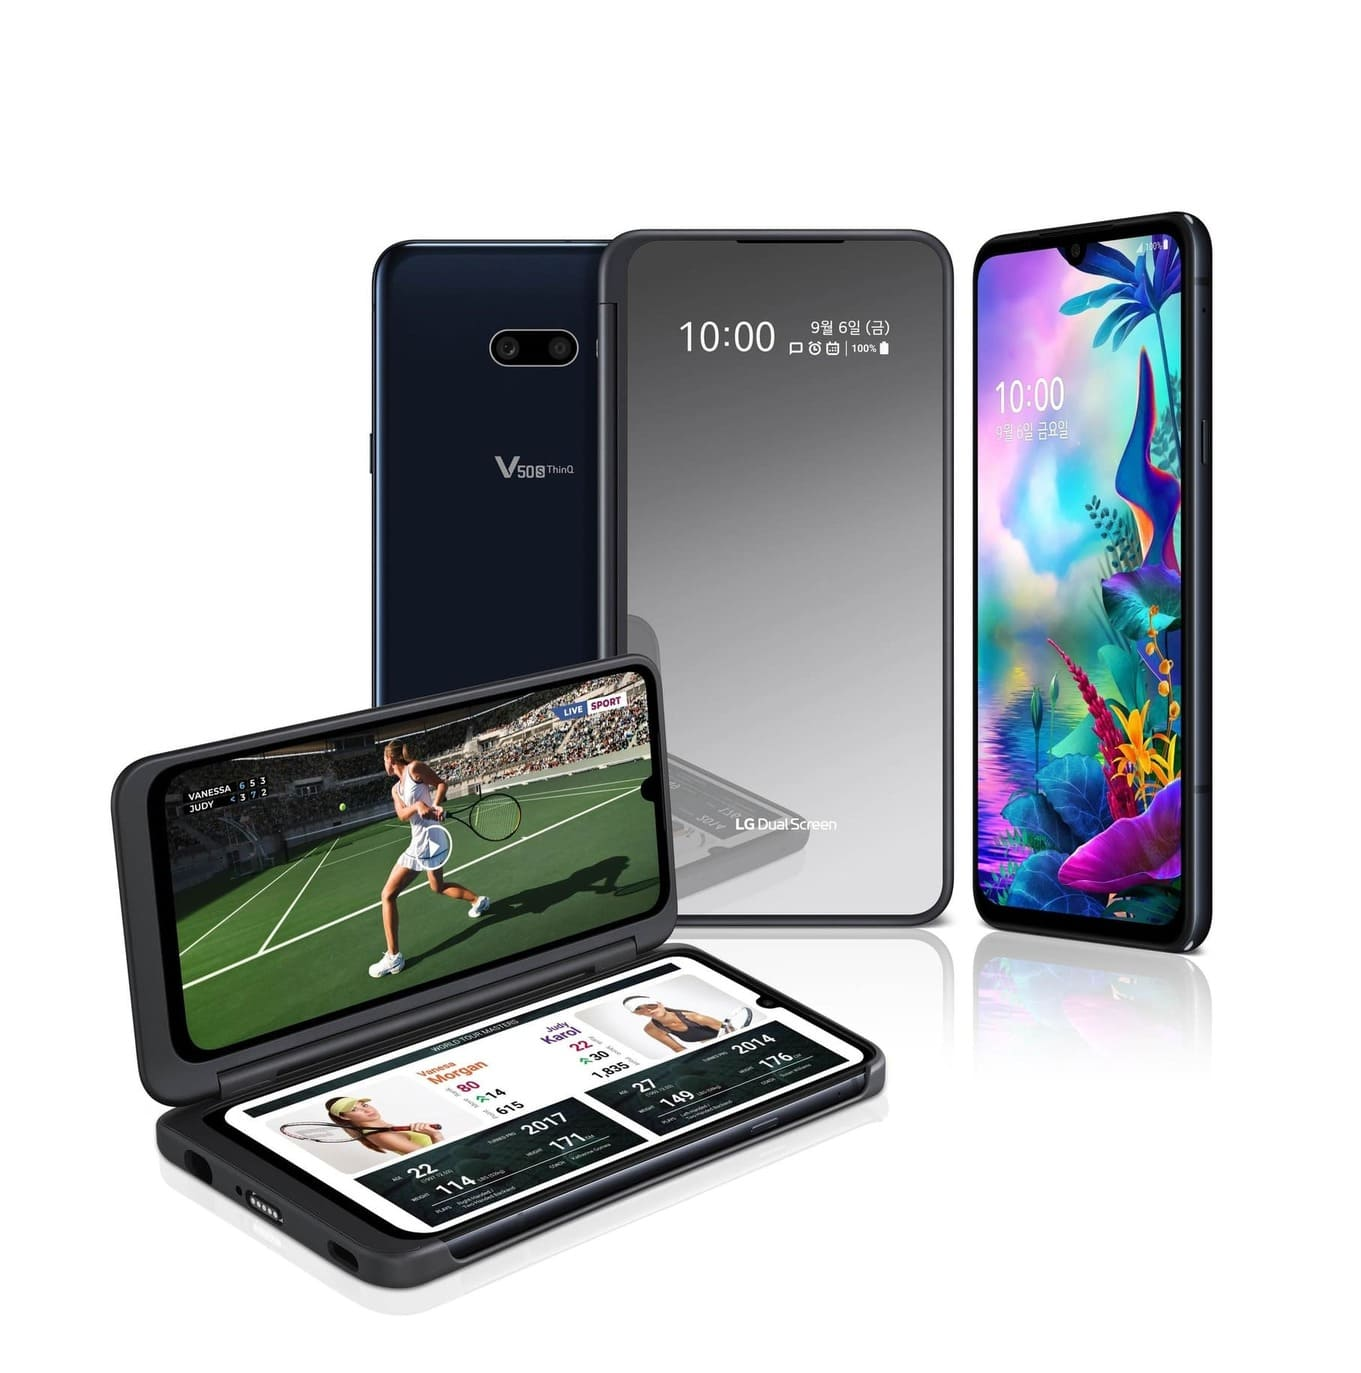 Представлен LG V50S ThinQ с 5G – клон G8x ThinQ для внутреннего рынка